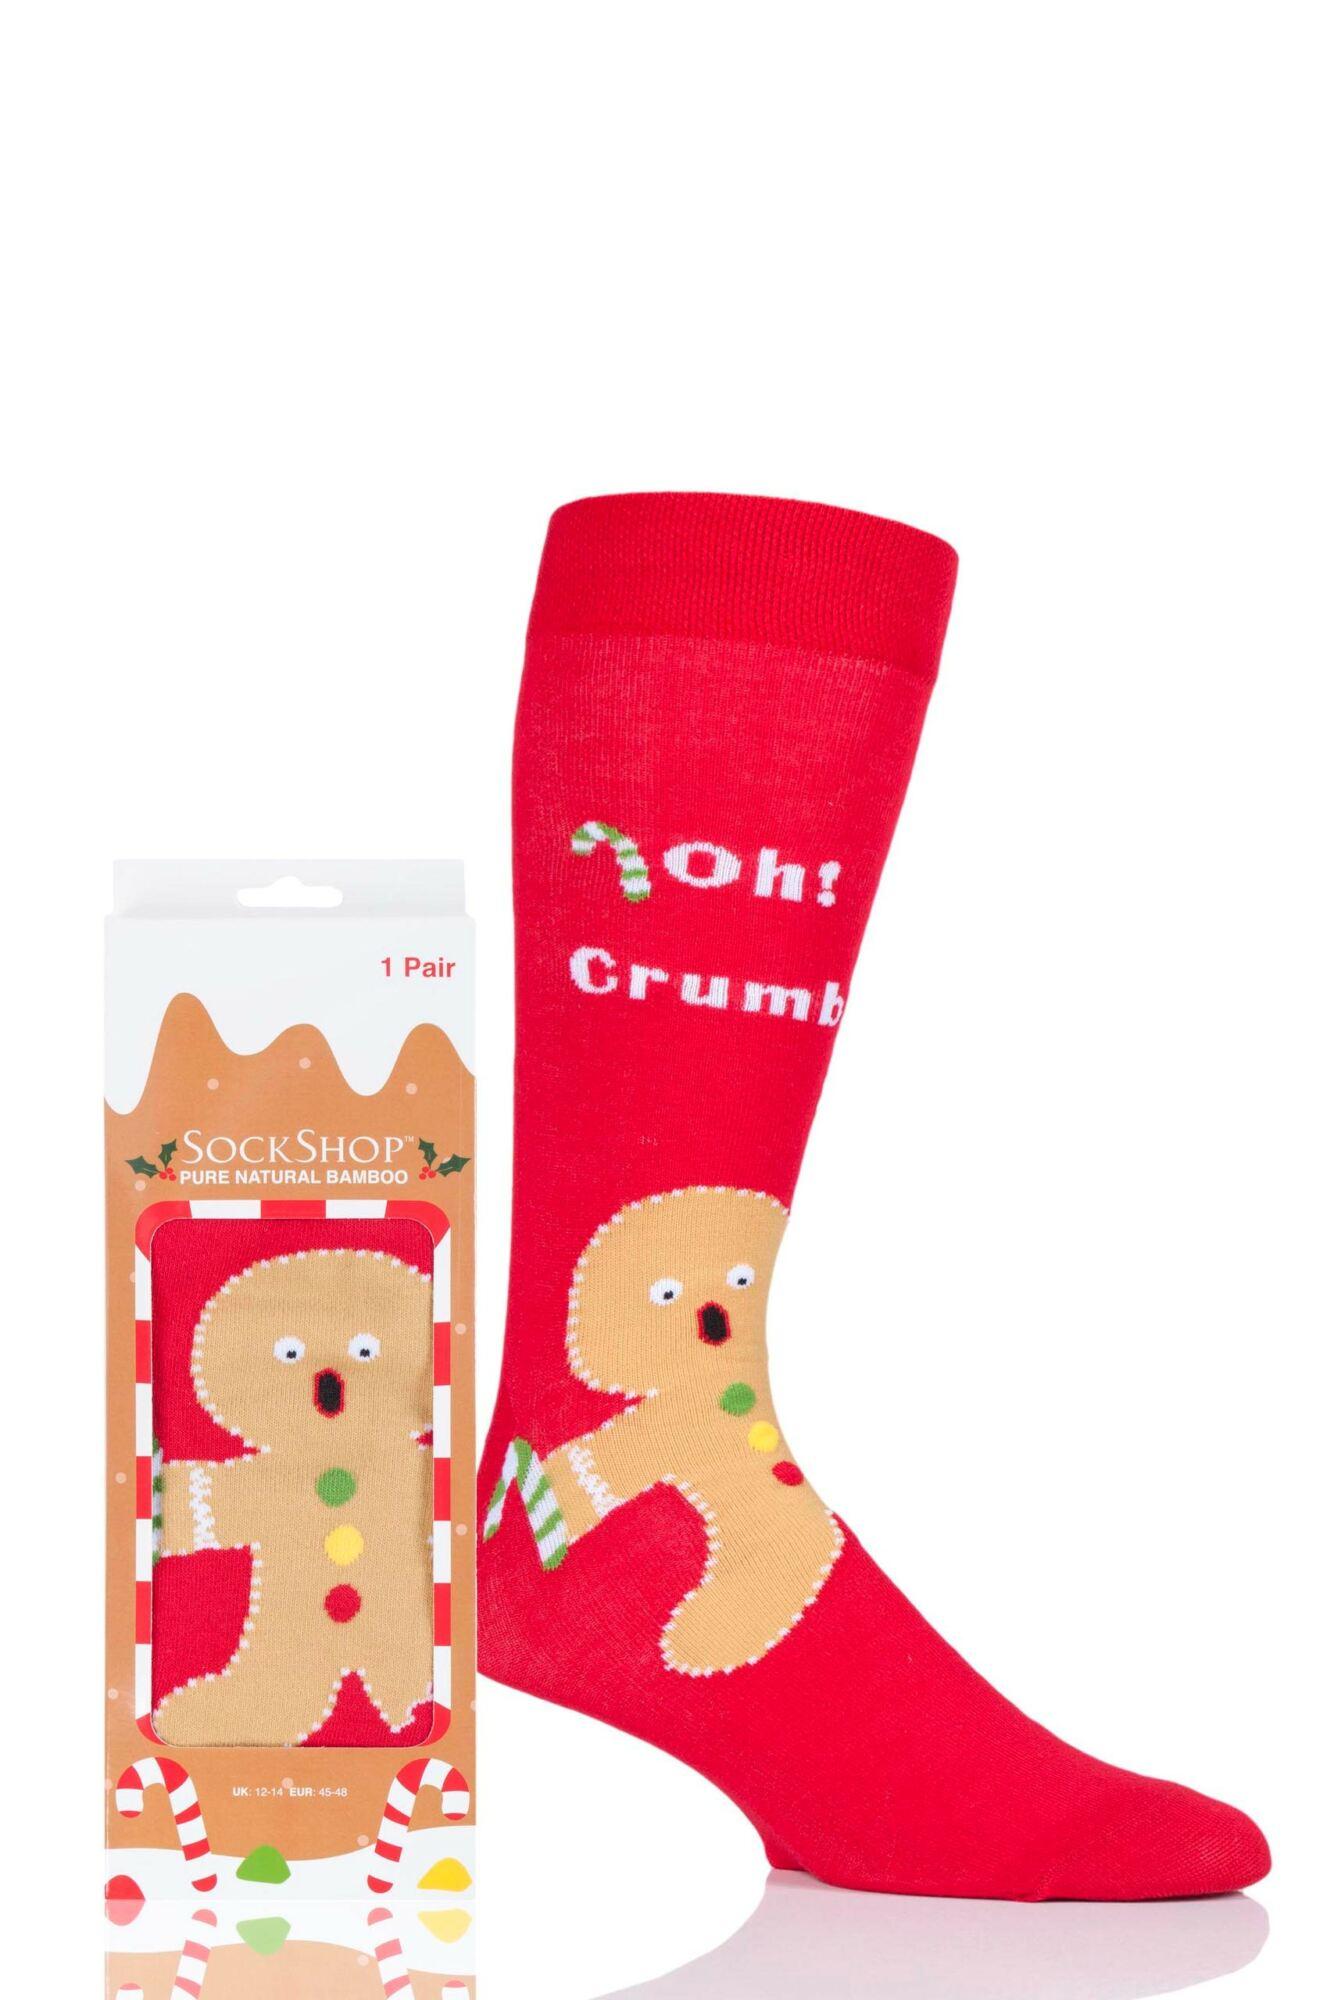 1 Pair Bamboo Gingerbread Man Christmas Gift Boxed Socks Unisex - Lazy Panda